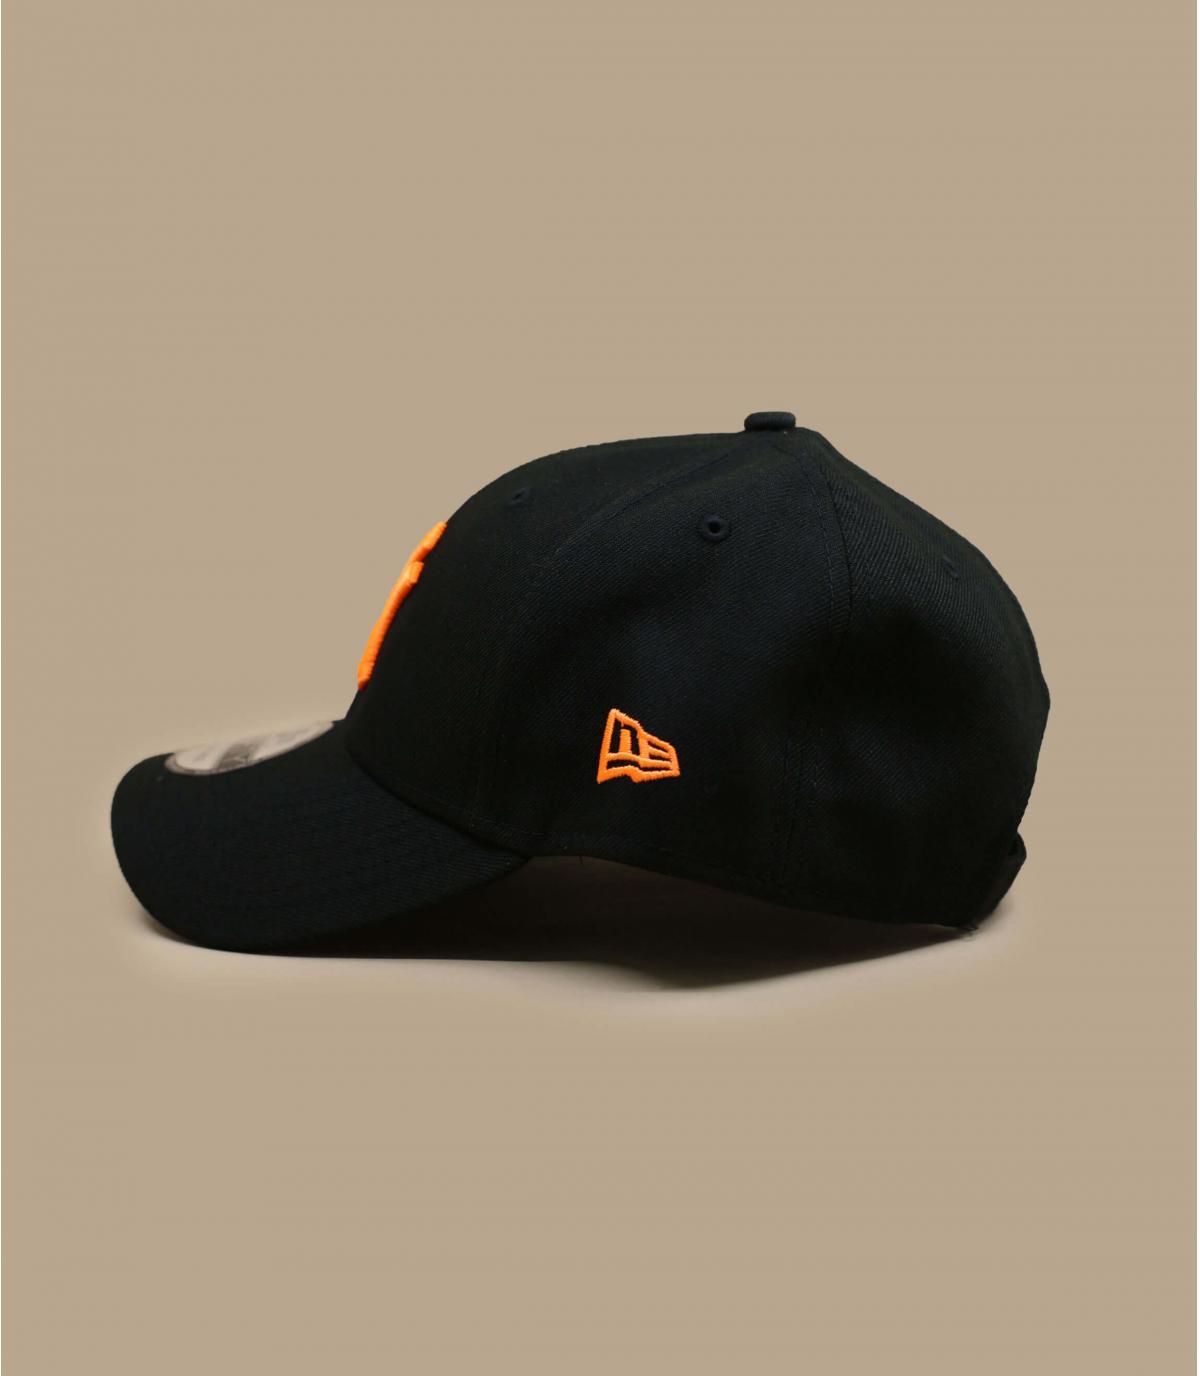 Details Neon Pack NY 940 black orange - Abbildung 3